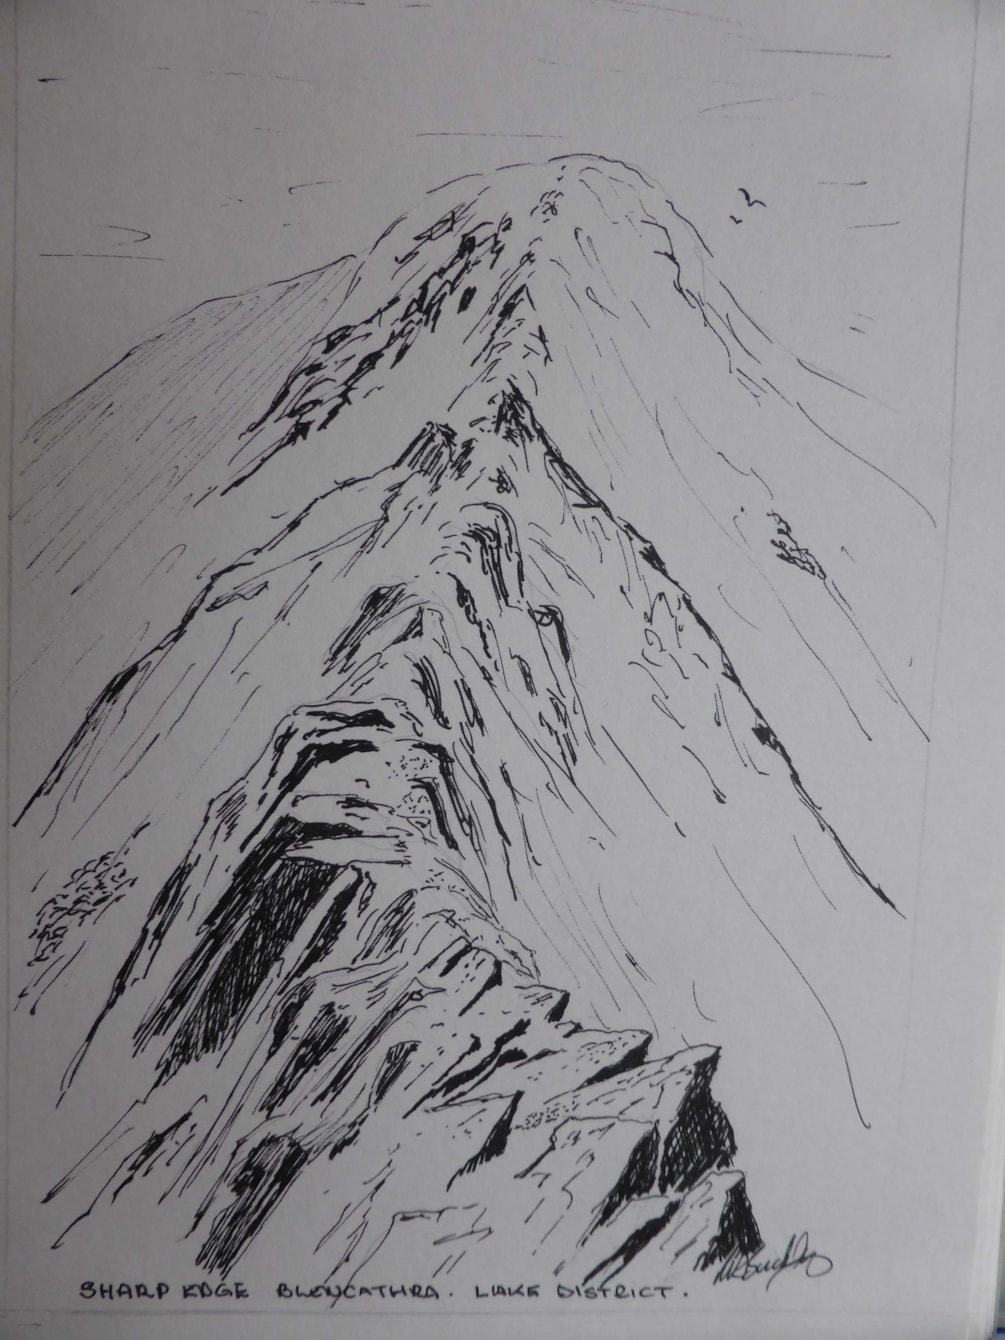 Sharpe Edge Blencathera, pen and ink sketch